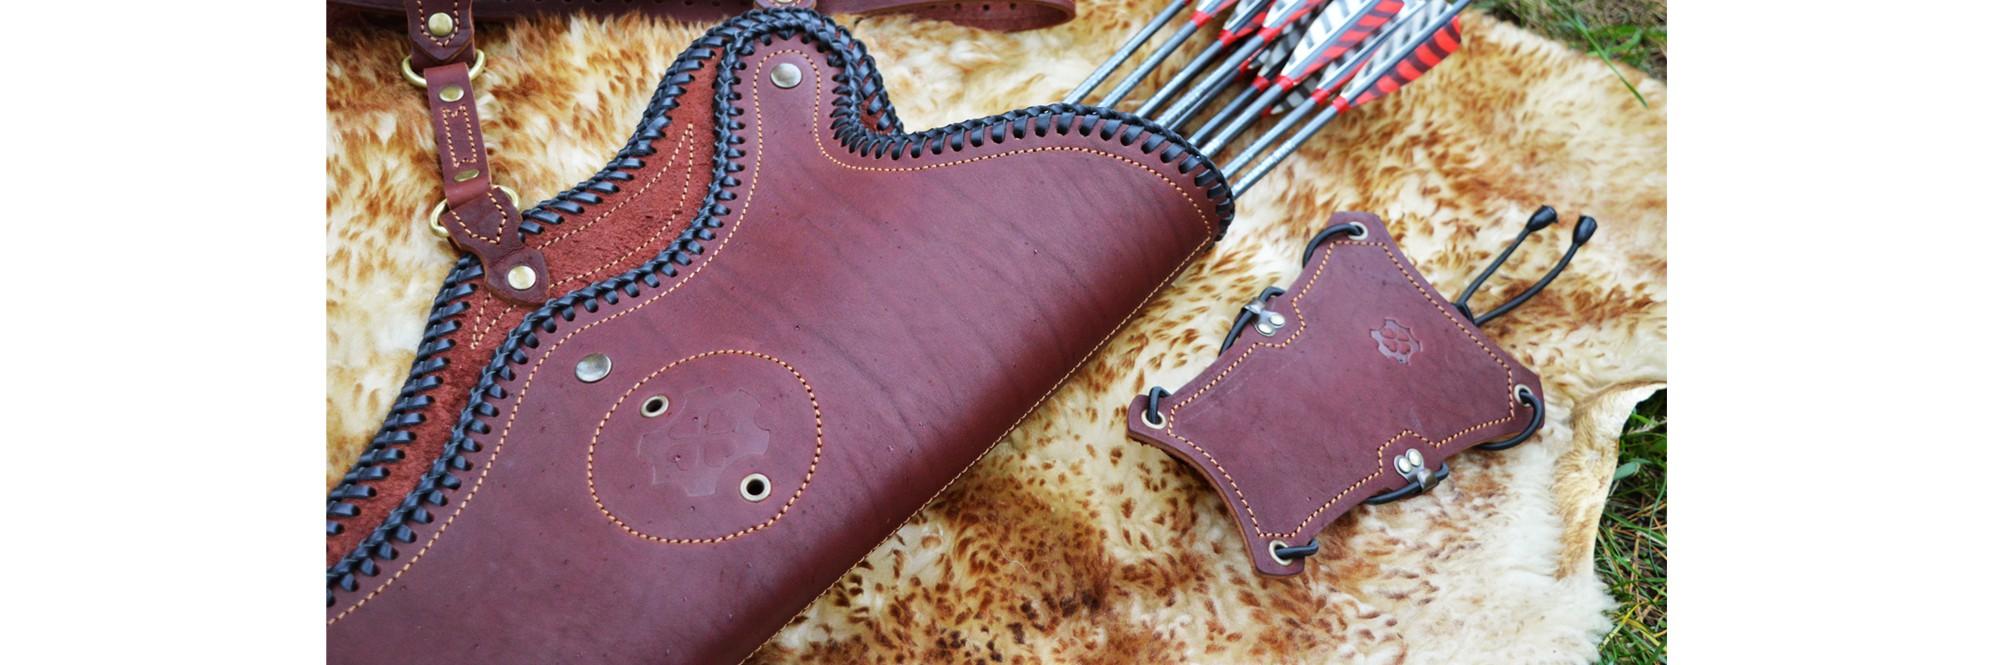 Belt Quivers, Hip Quivers, Handmade